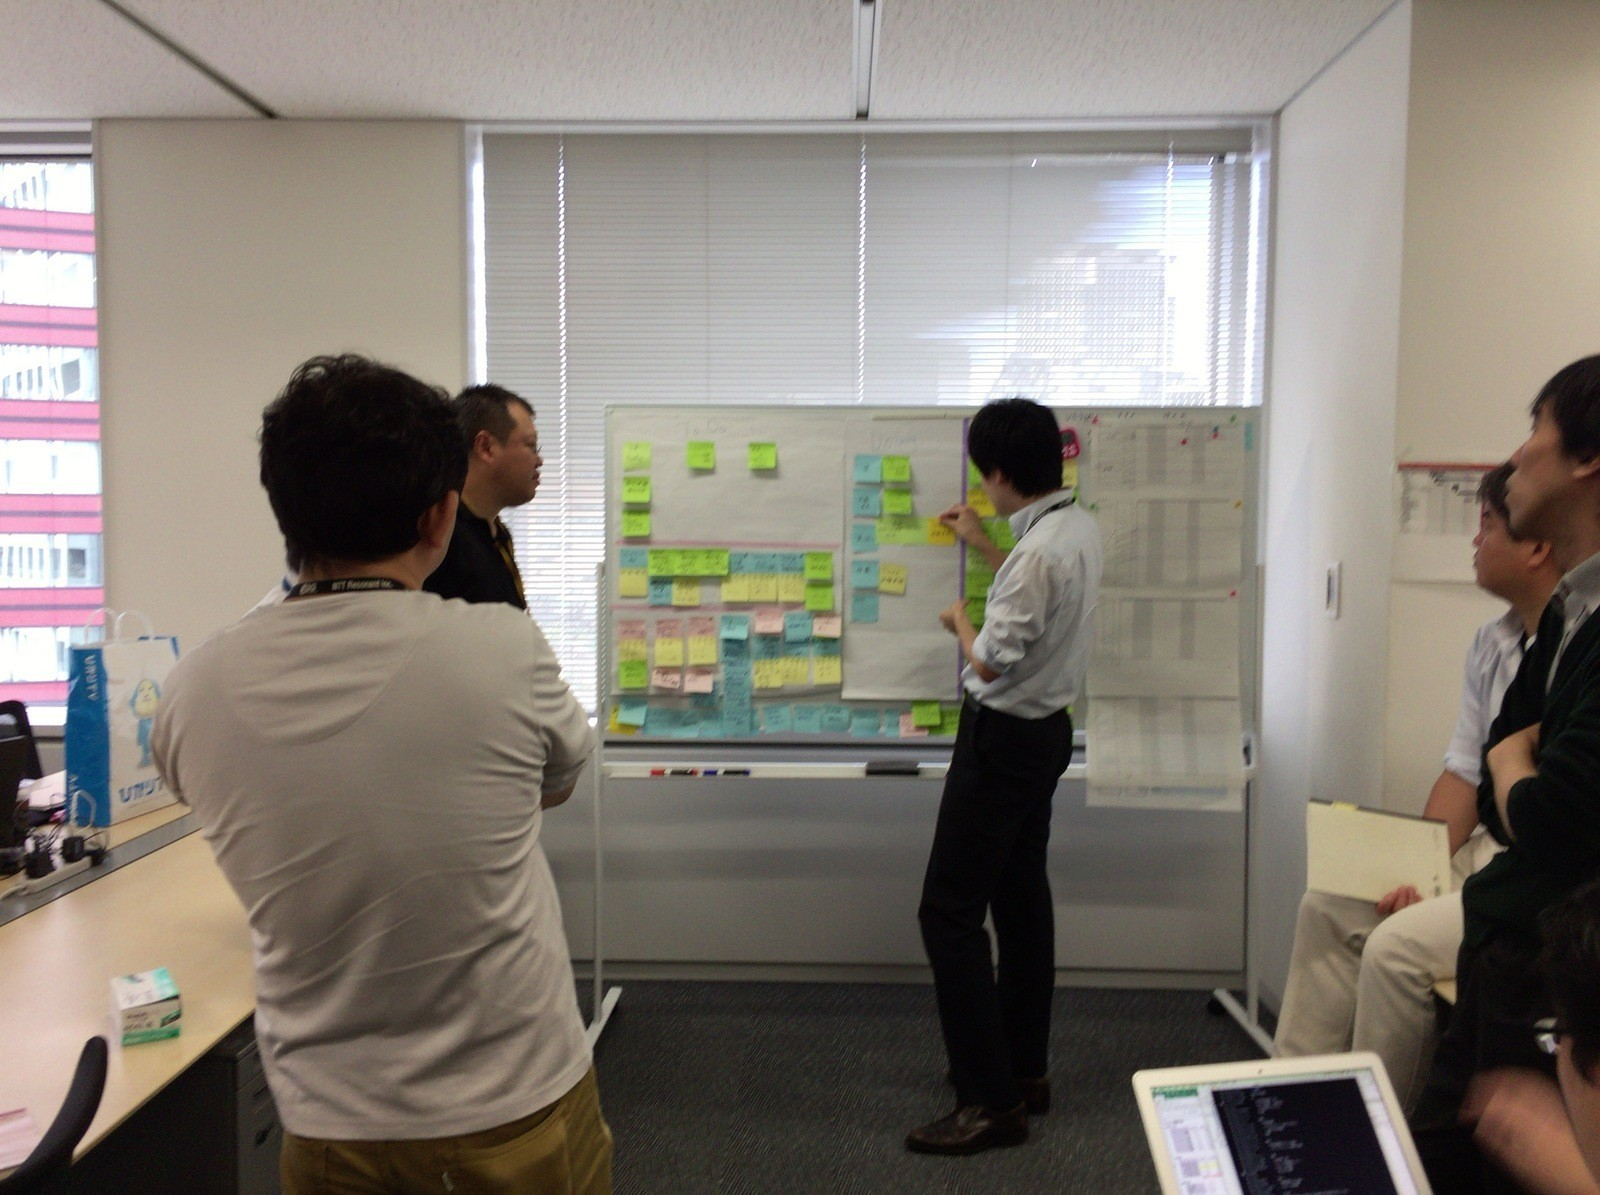 【iOS開発】シェアトップクラス・NTTの有料クラウドストレージサービス「マイポケット」をアジャイル開発するエンジニア募集!